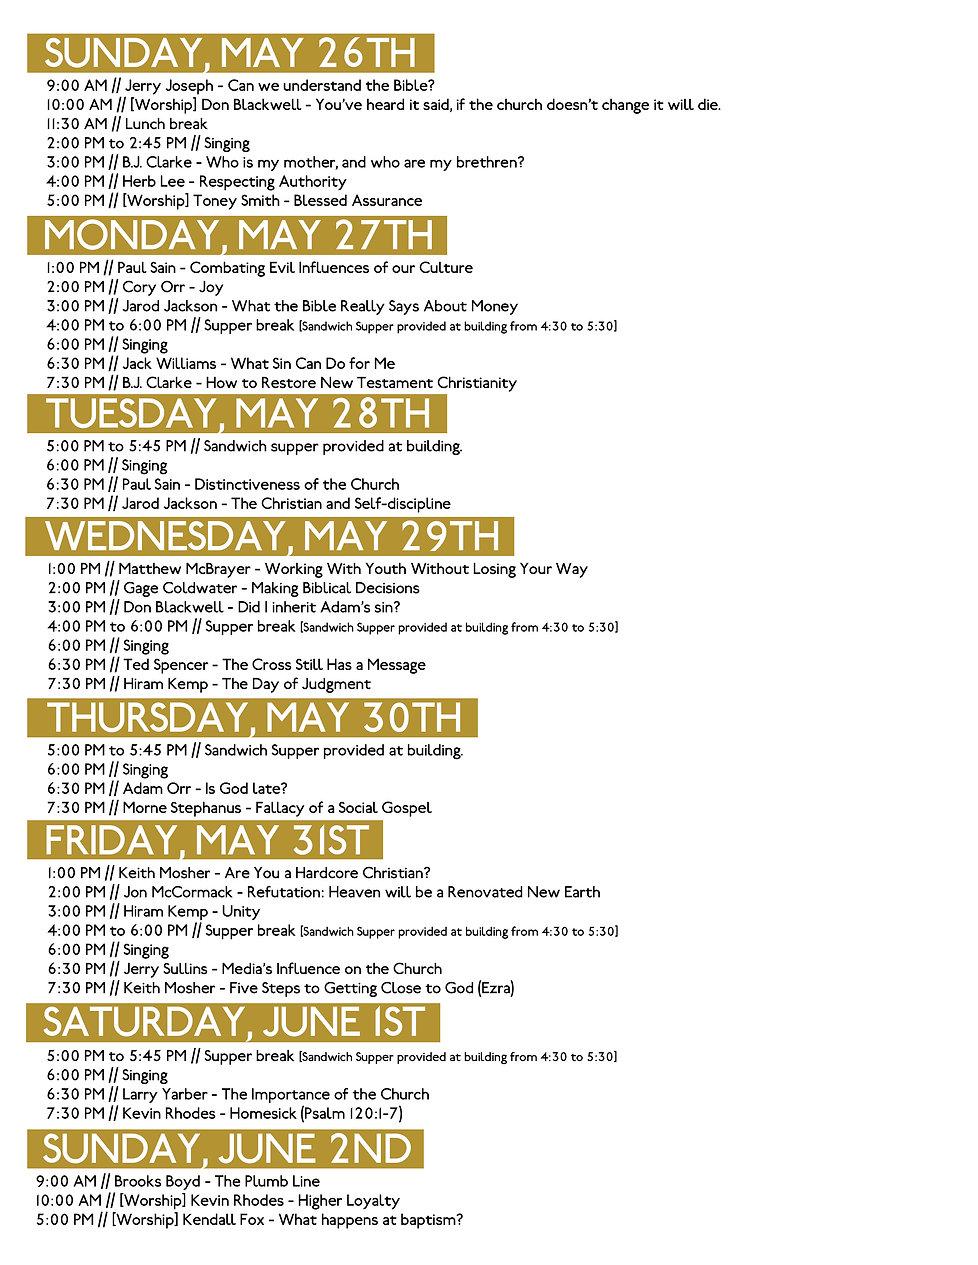 2019-Flyer schedule 03.jpg